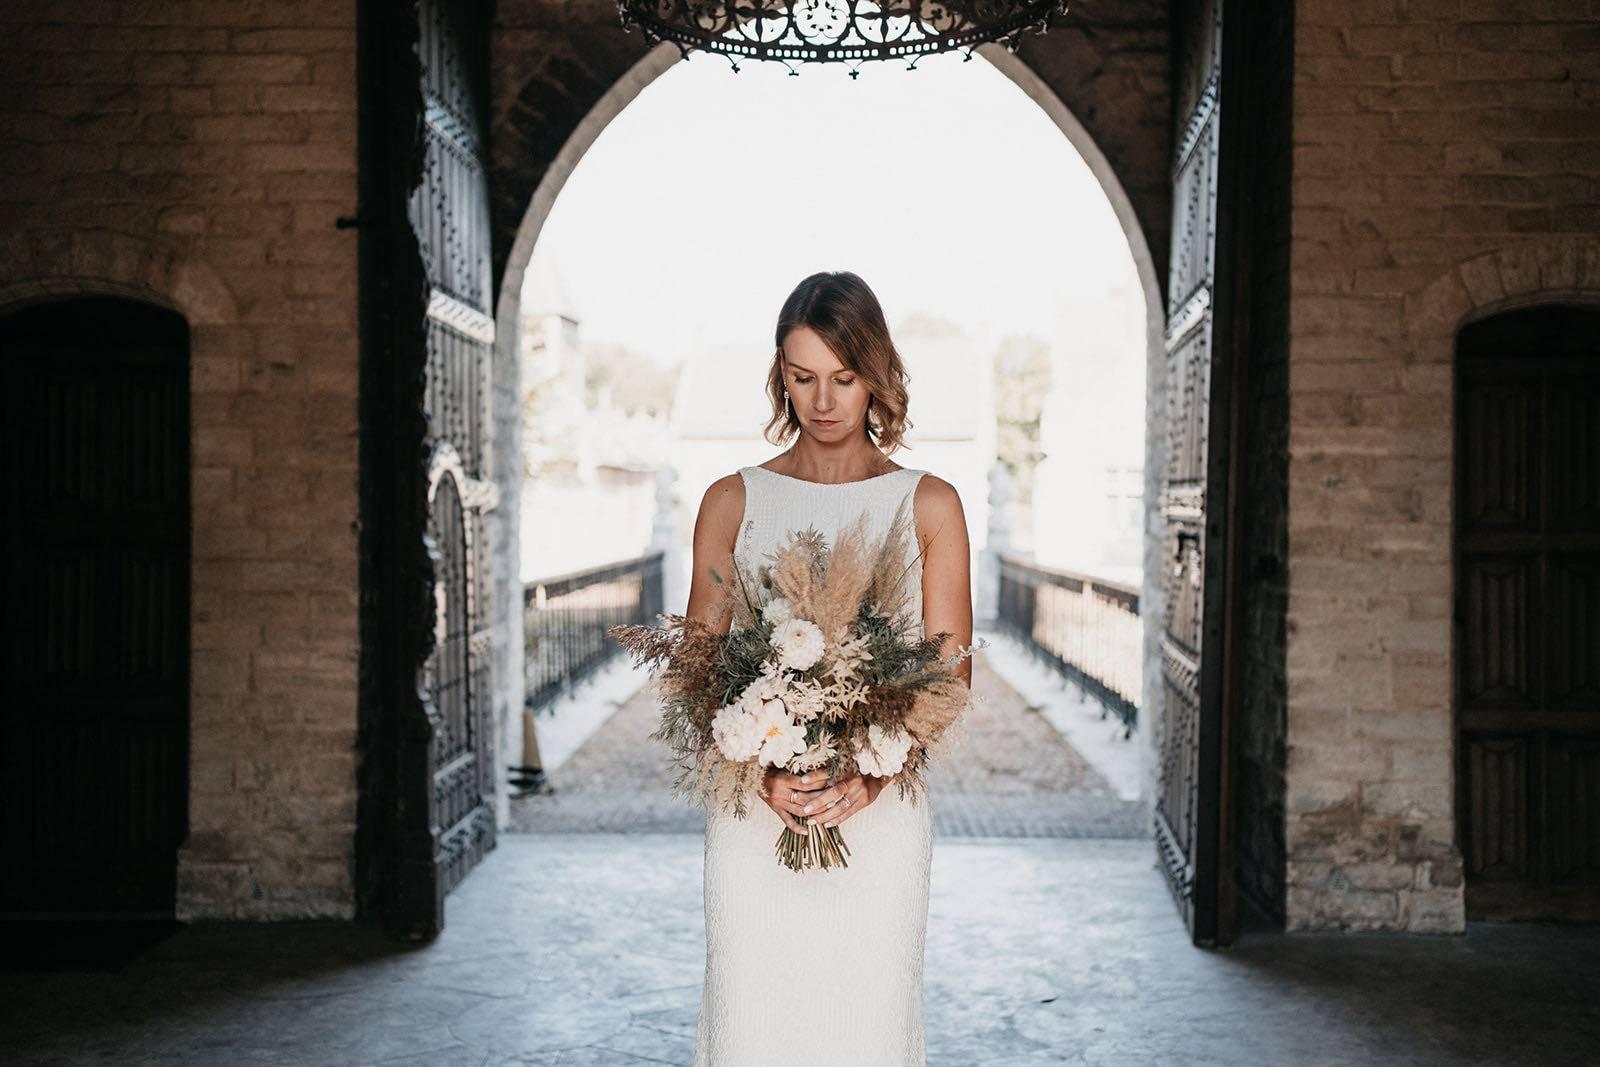 Ginger & Ginder - Ticia _ Tom - bruidsboeket (c) Melissa Milis - House of Weddings